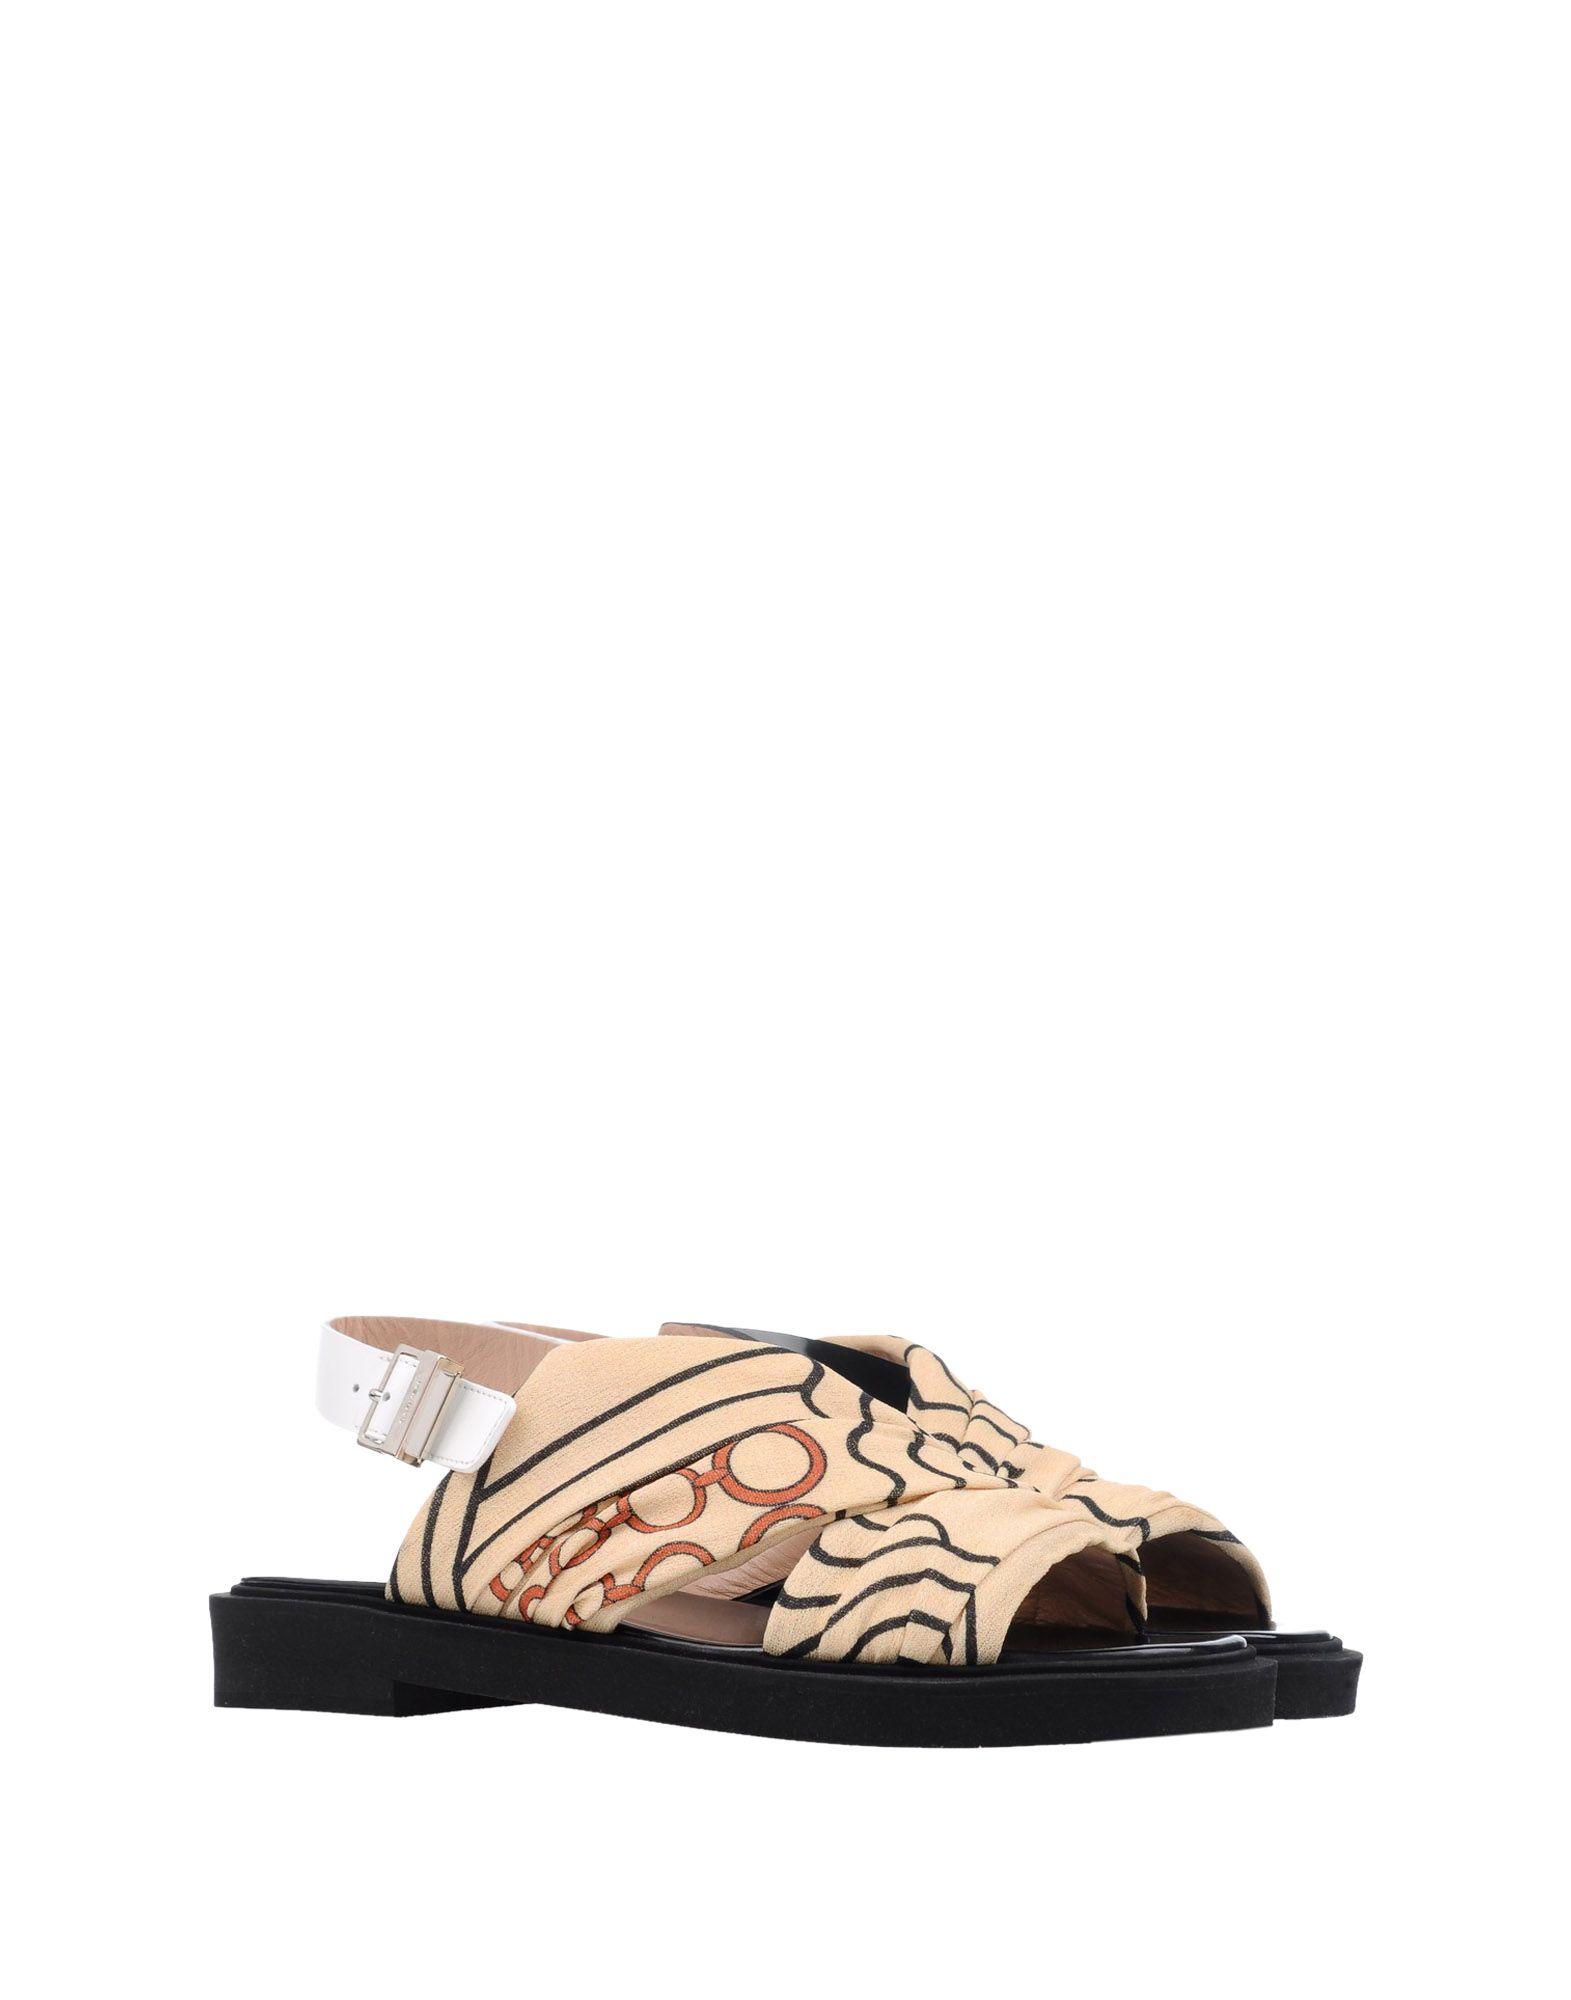 Stilvolle billige Schuhe Carven Sandalen Damen Damen Damen  11338232GE 2c0d71